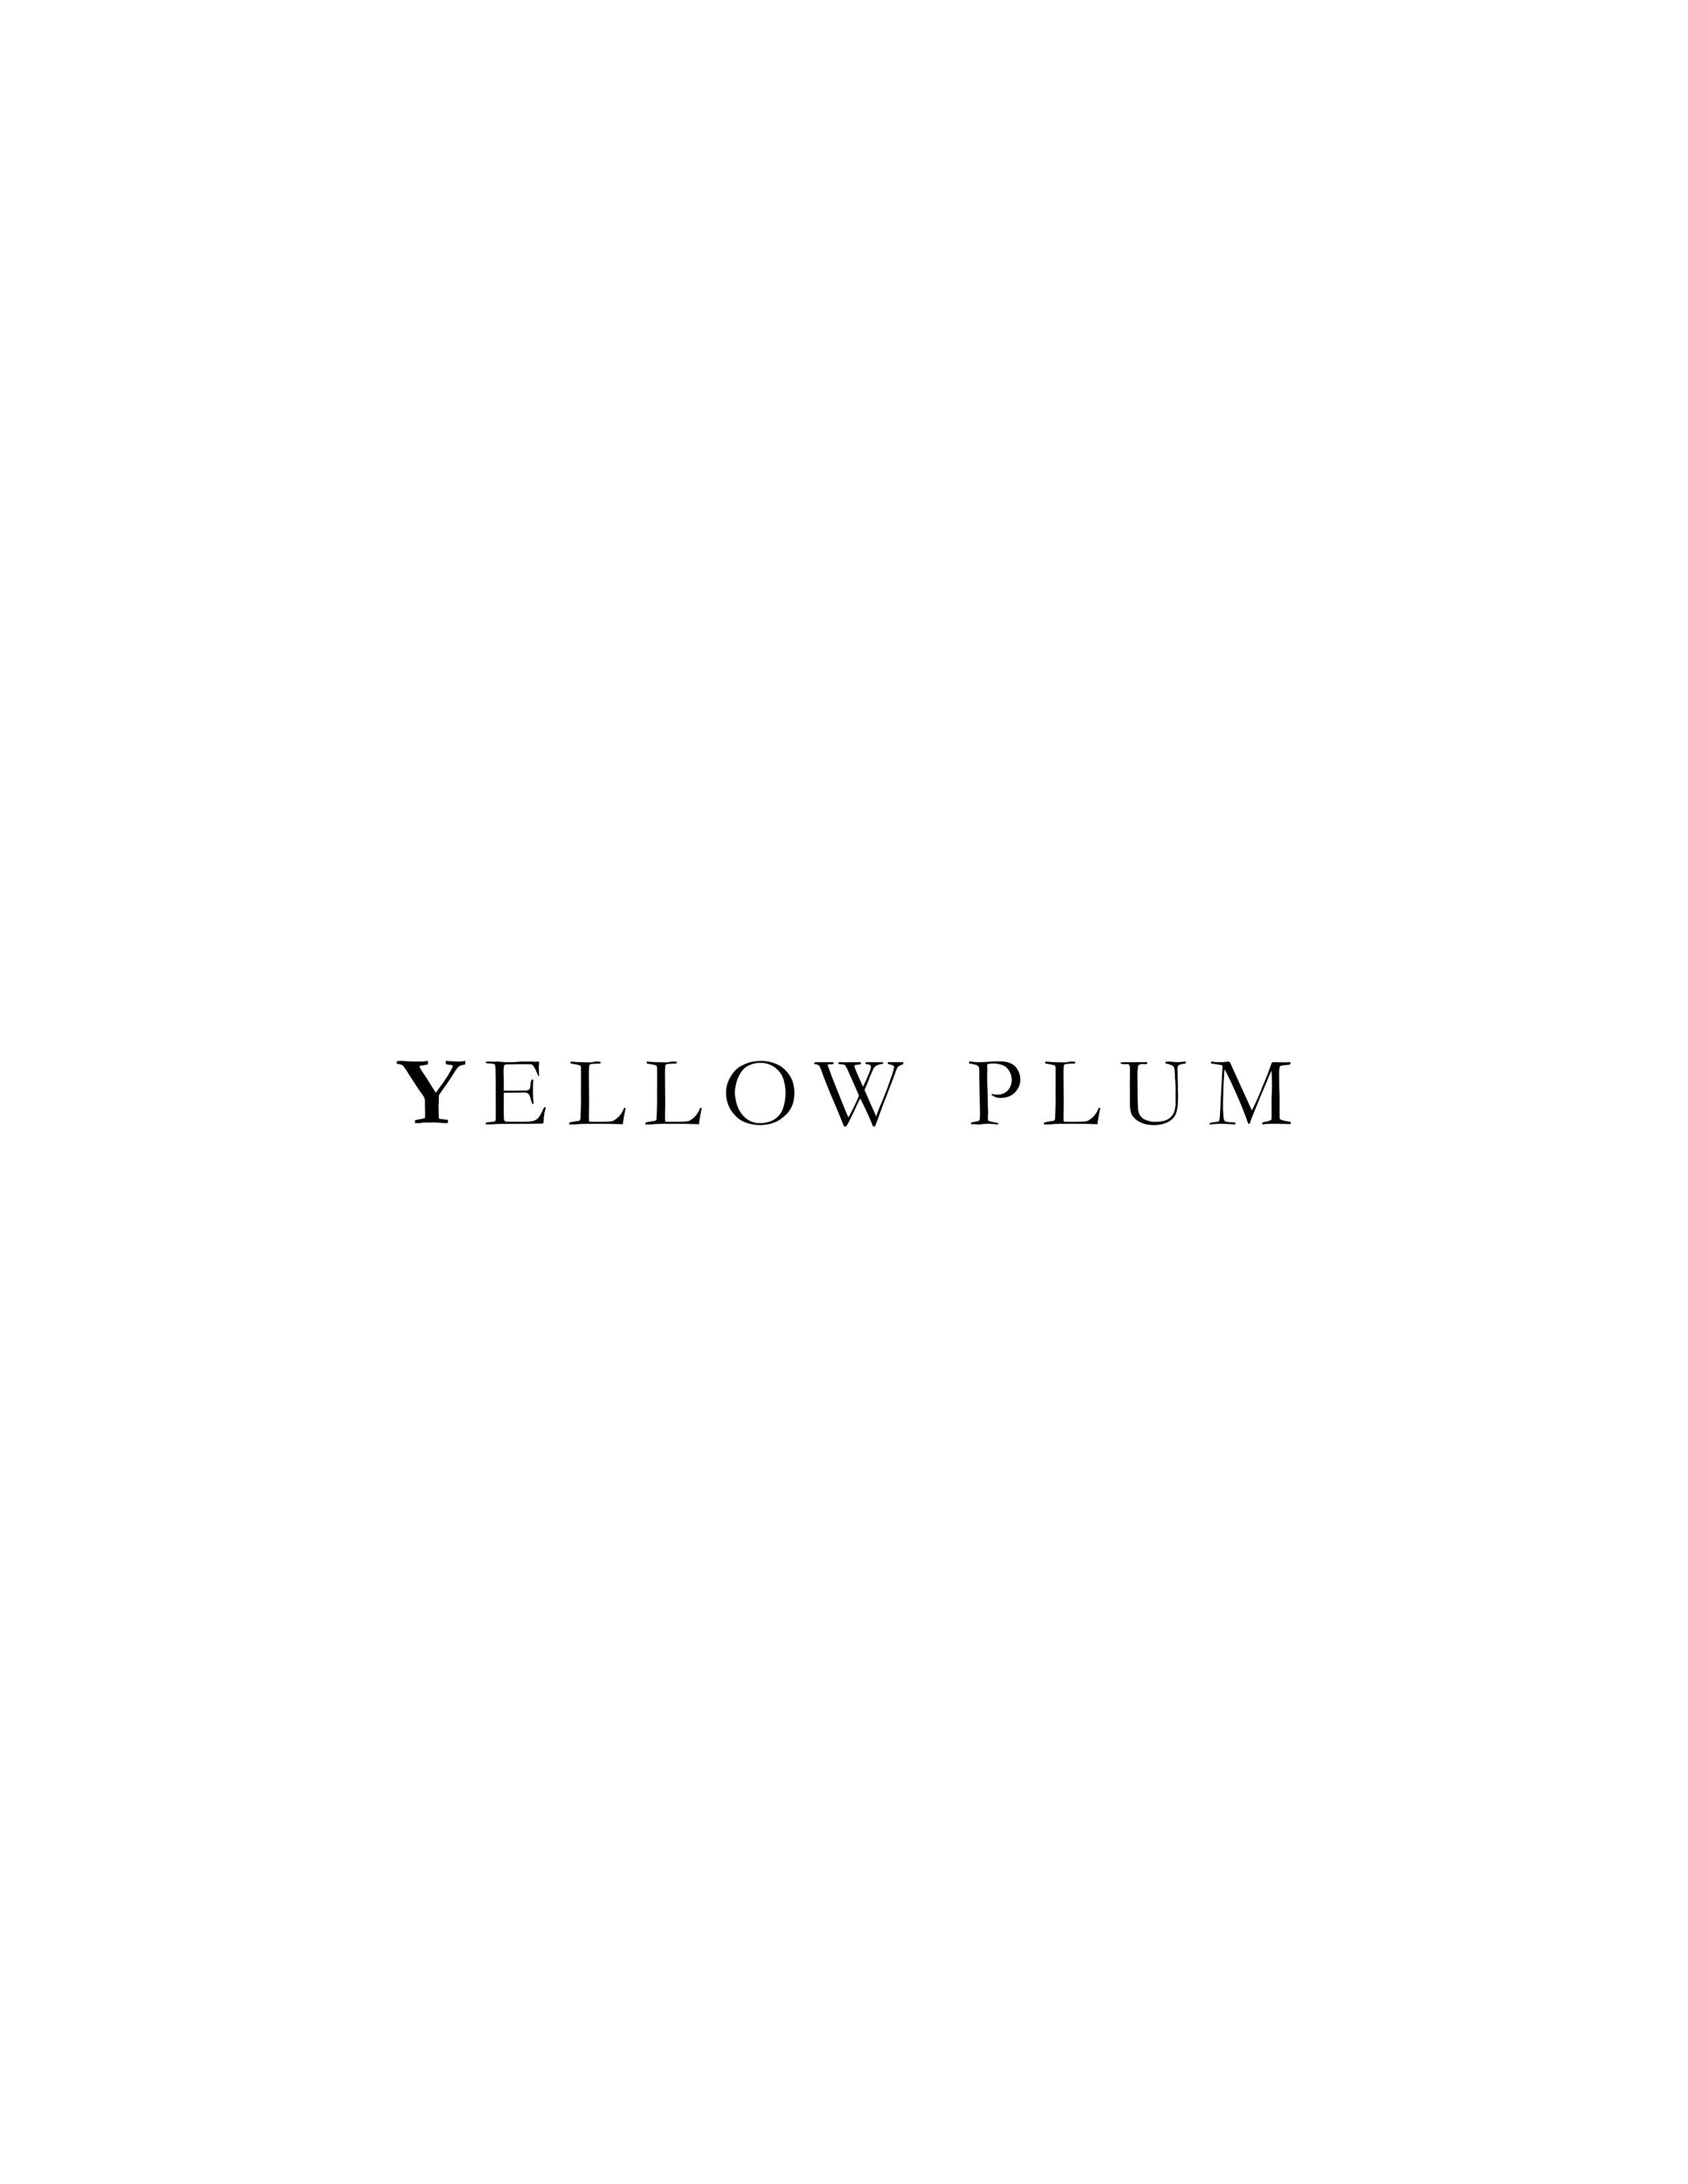 Yellow Plum TEXT.jpg